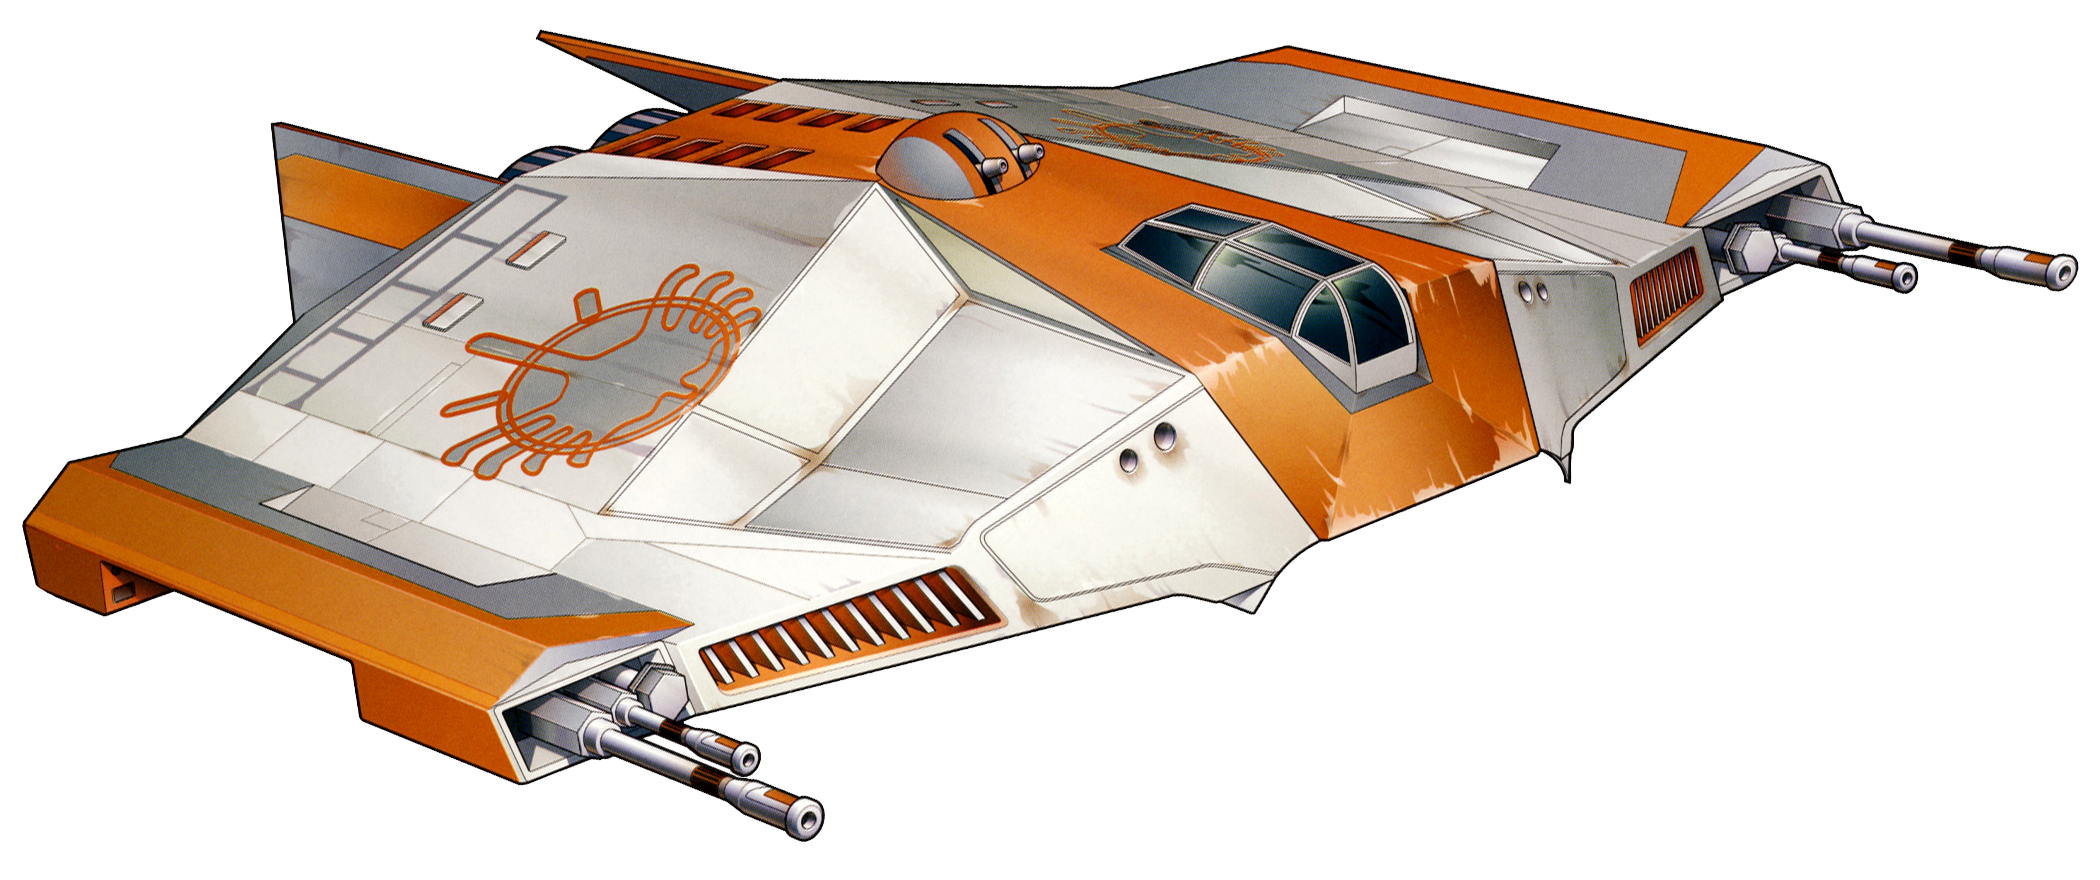 Star wars ships clipart image Havoc (starfighter) | Wookieepedia | FANDOM powered by Wikia image